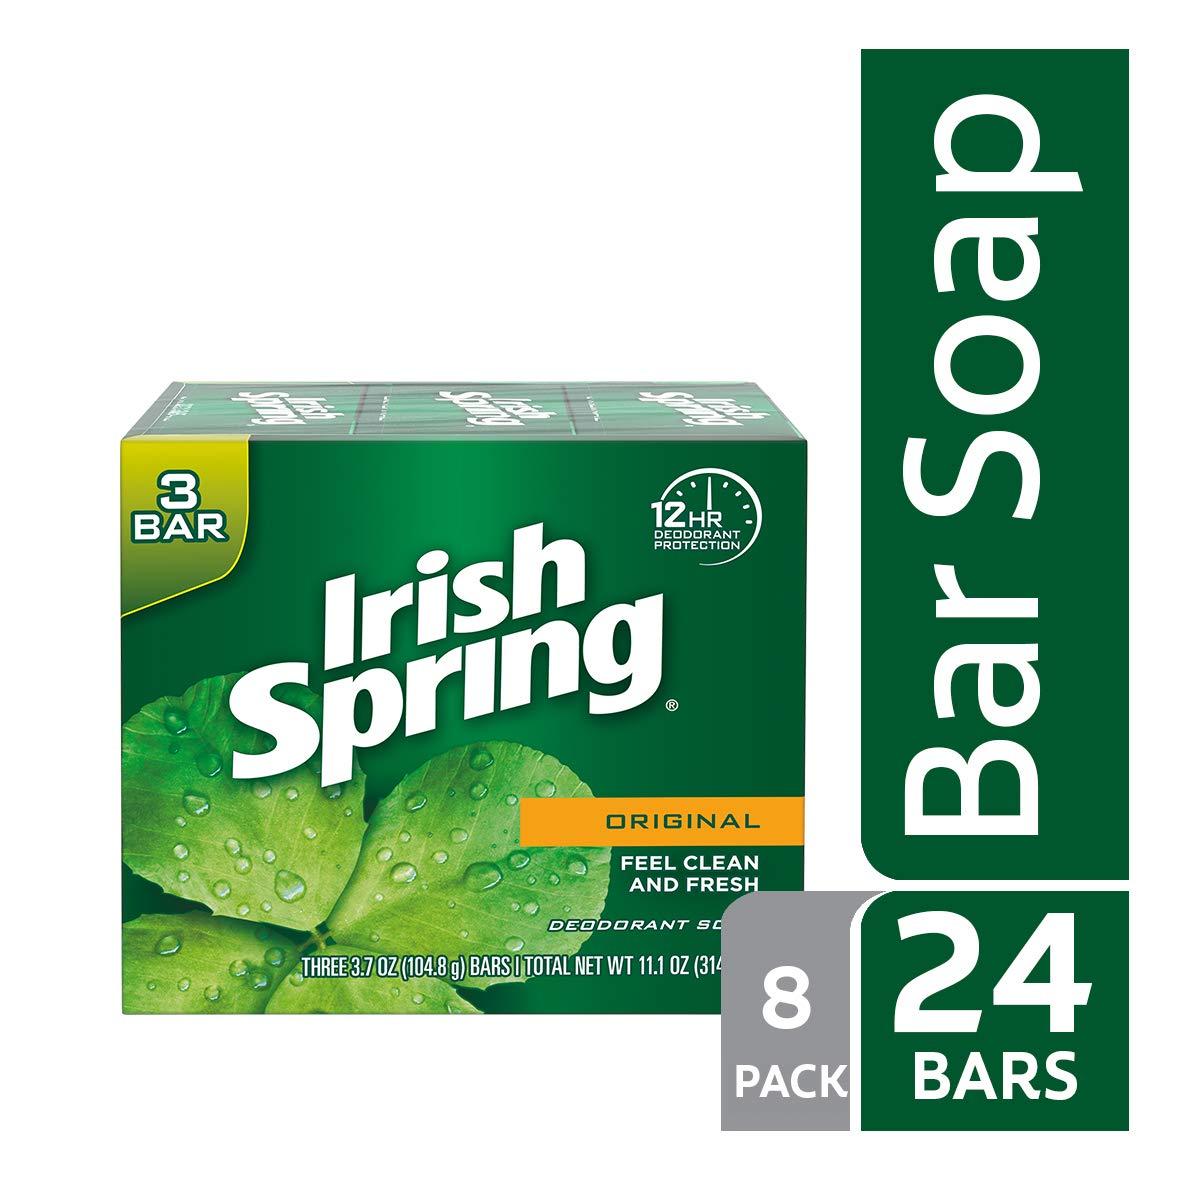 Irish Spring Original Deodorant Bar Soap, 3.7 Ounce, 3 Count (8 pack)